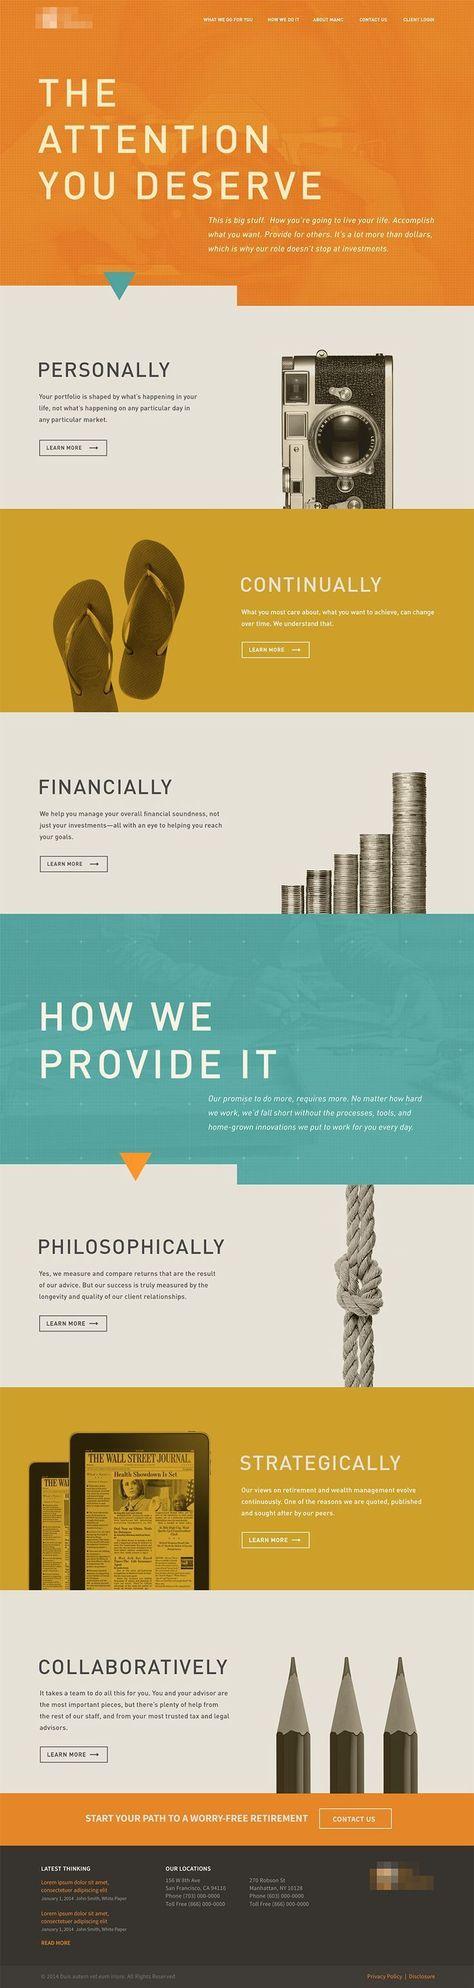 lauralin-website-design-v3-fullview.jpg by Laura Lin